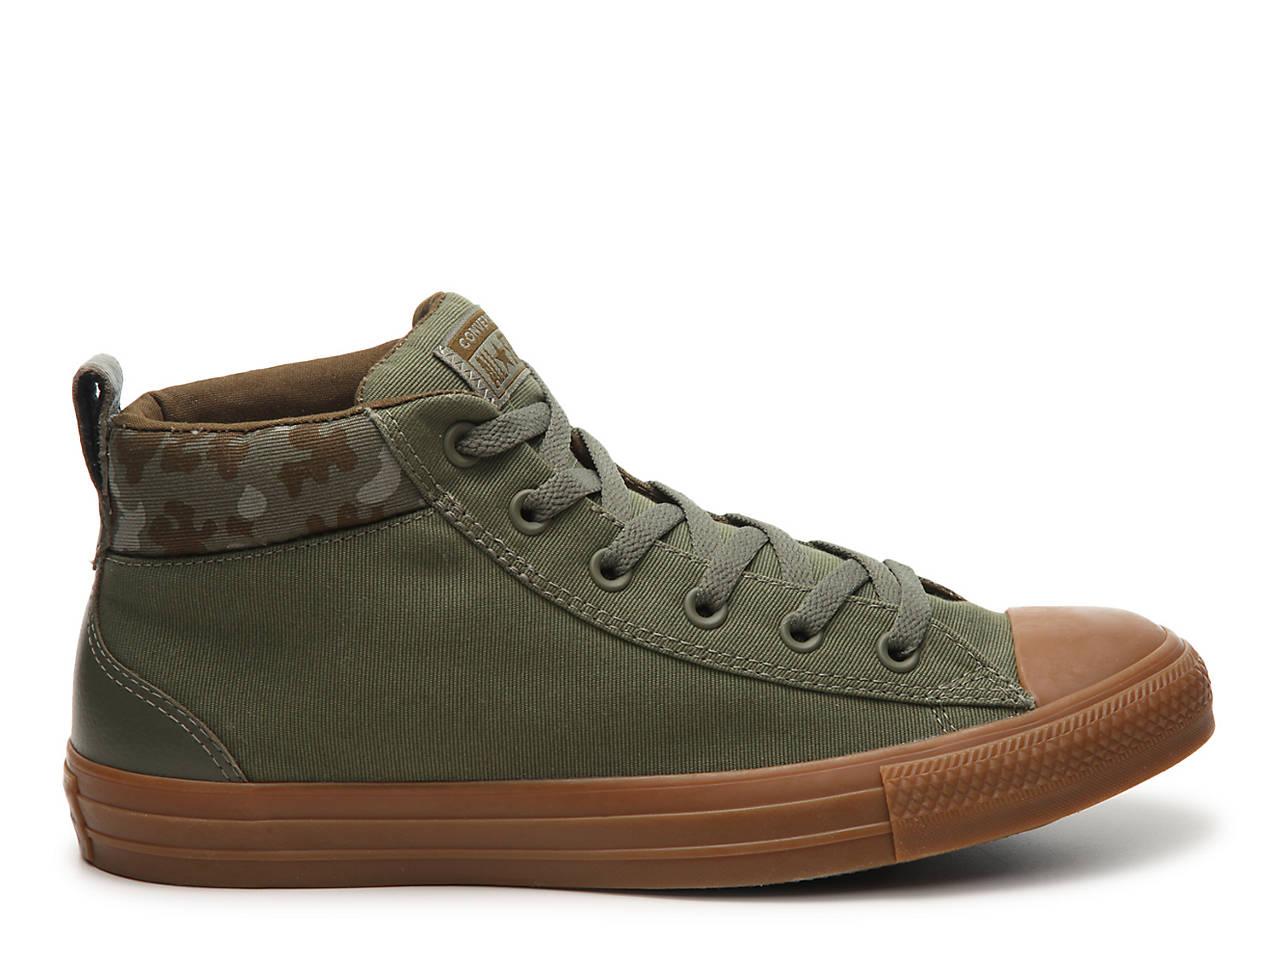 8b87904e60268f Converse Chuck Taylor All Star Street Camo High-Top Sneaker - Men s ...